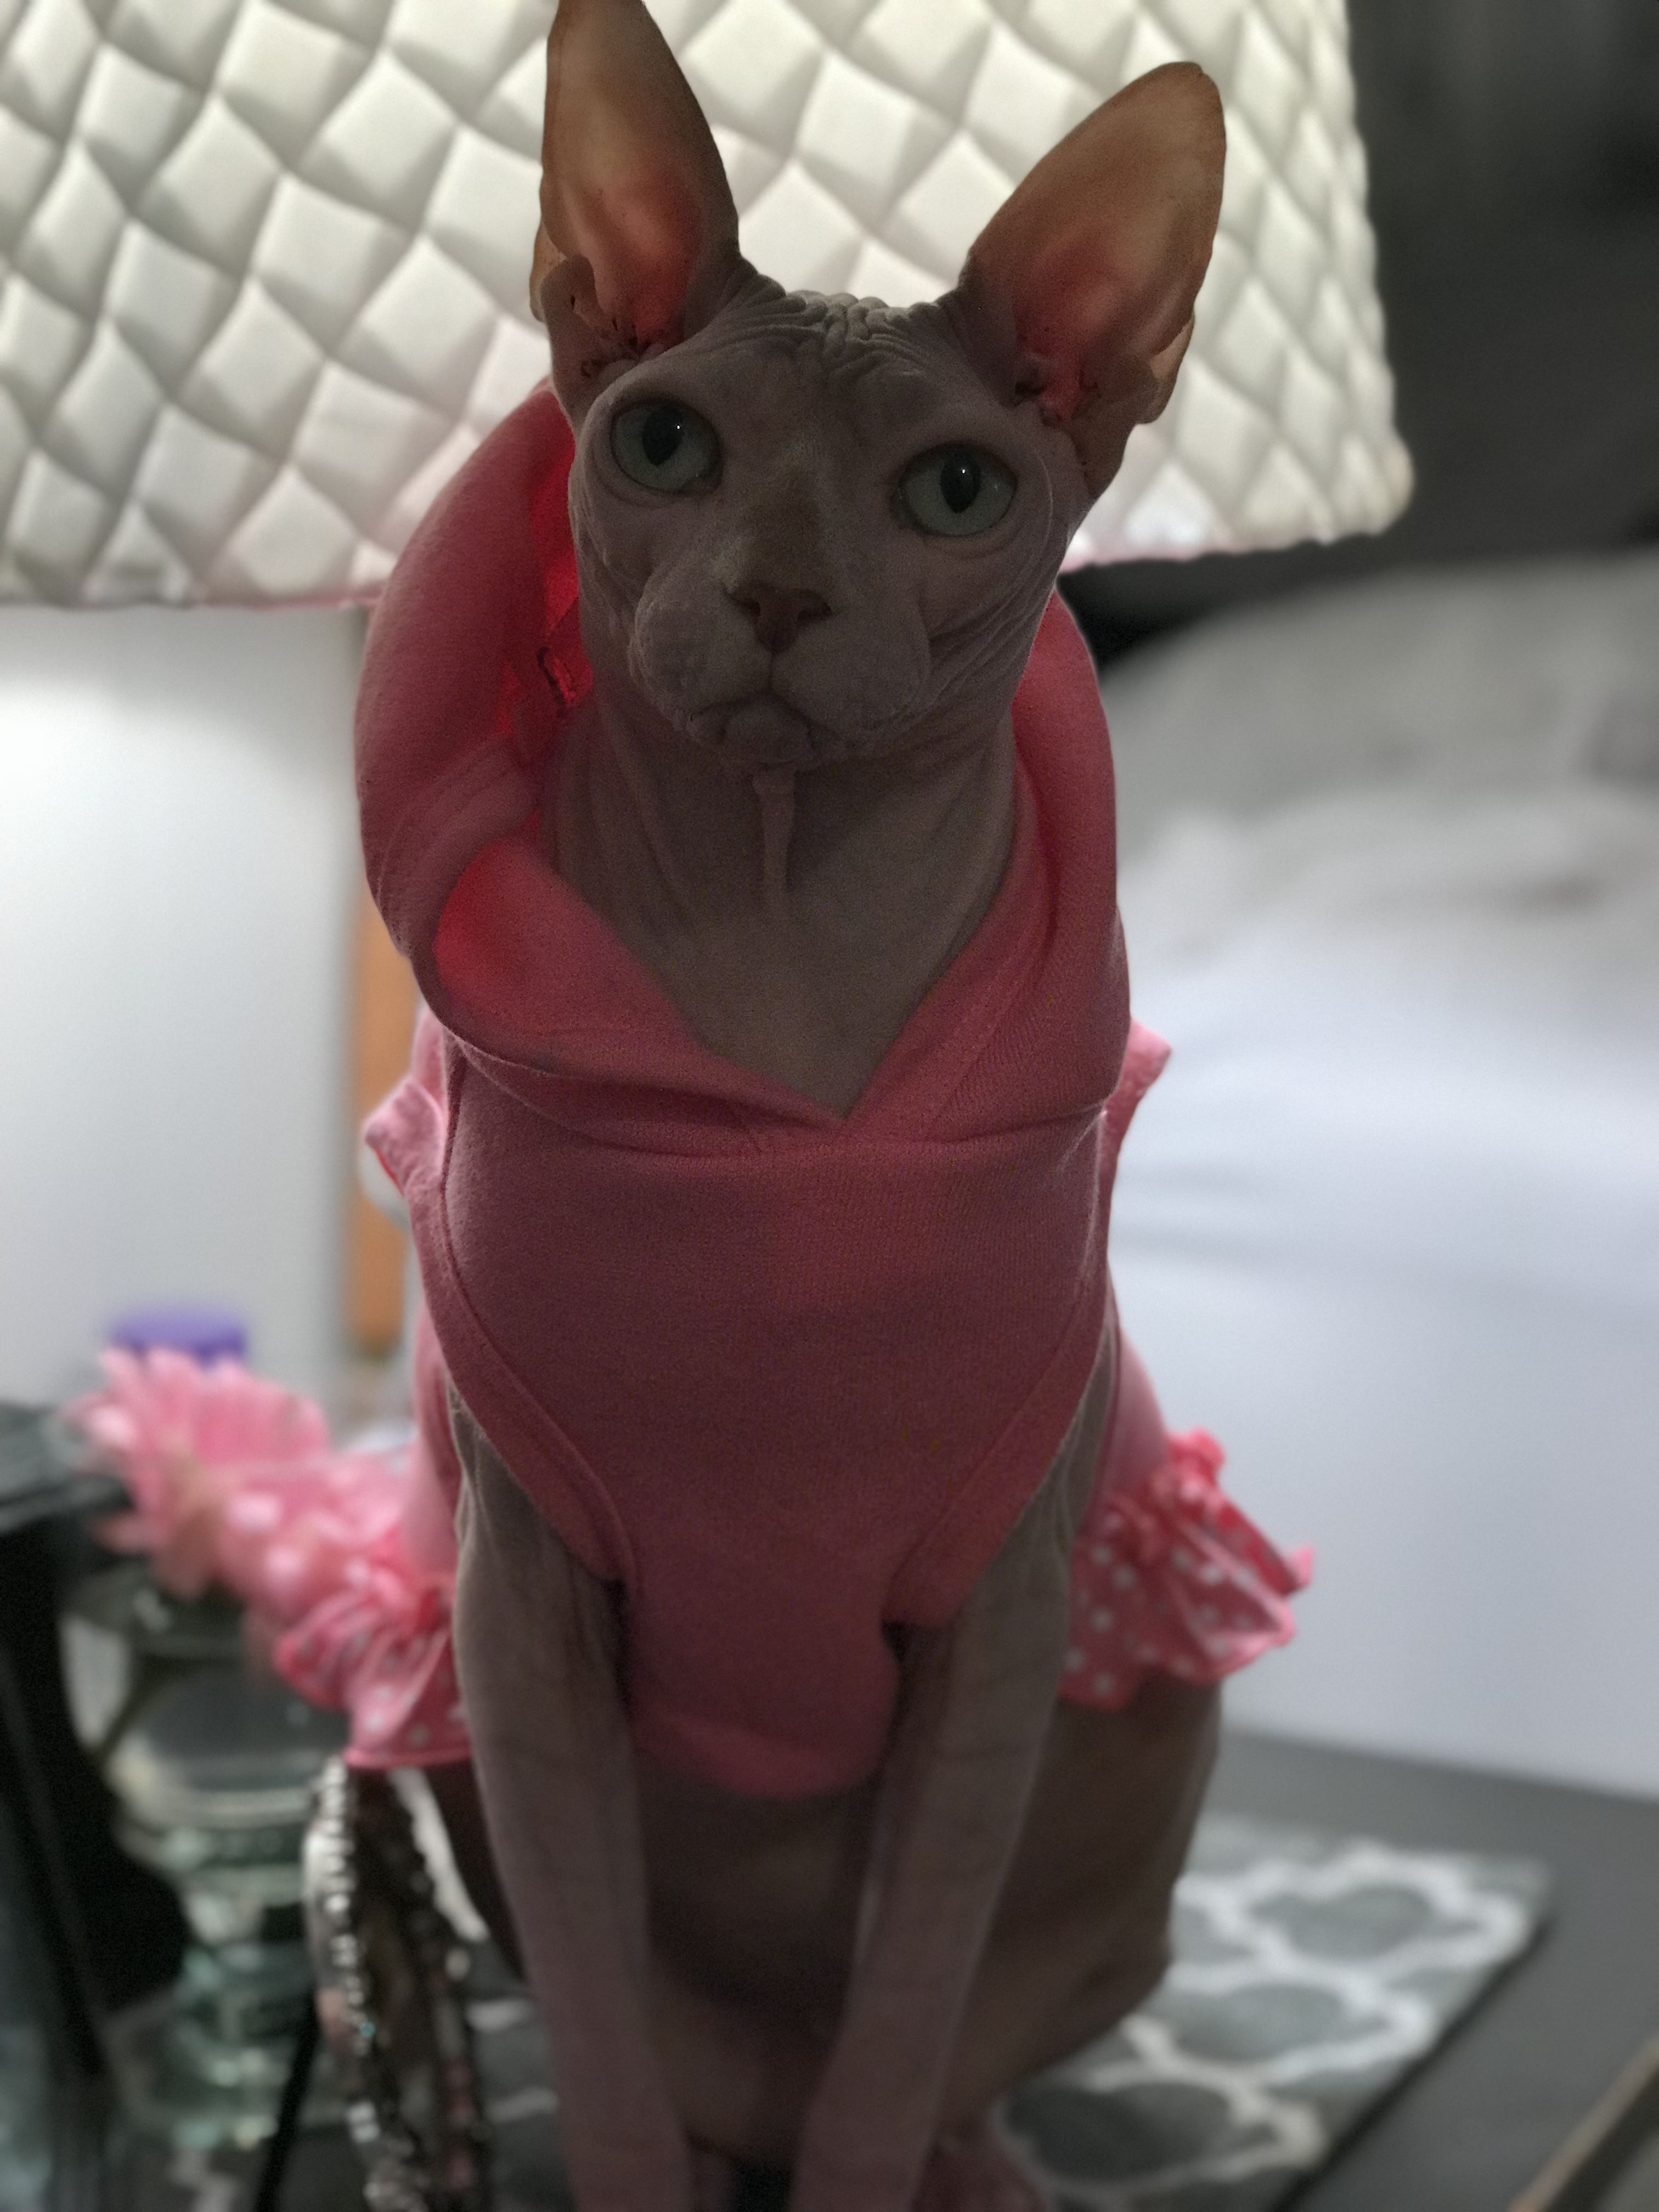 Sphynx cat Cats, kittens, Sphynx cat, Sphynx